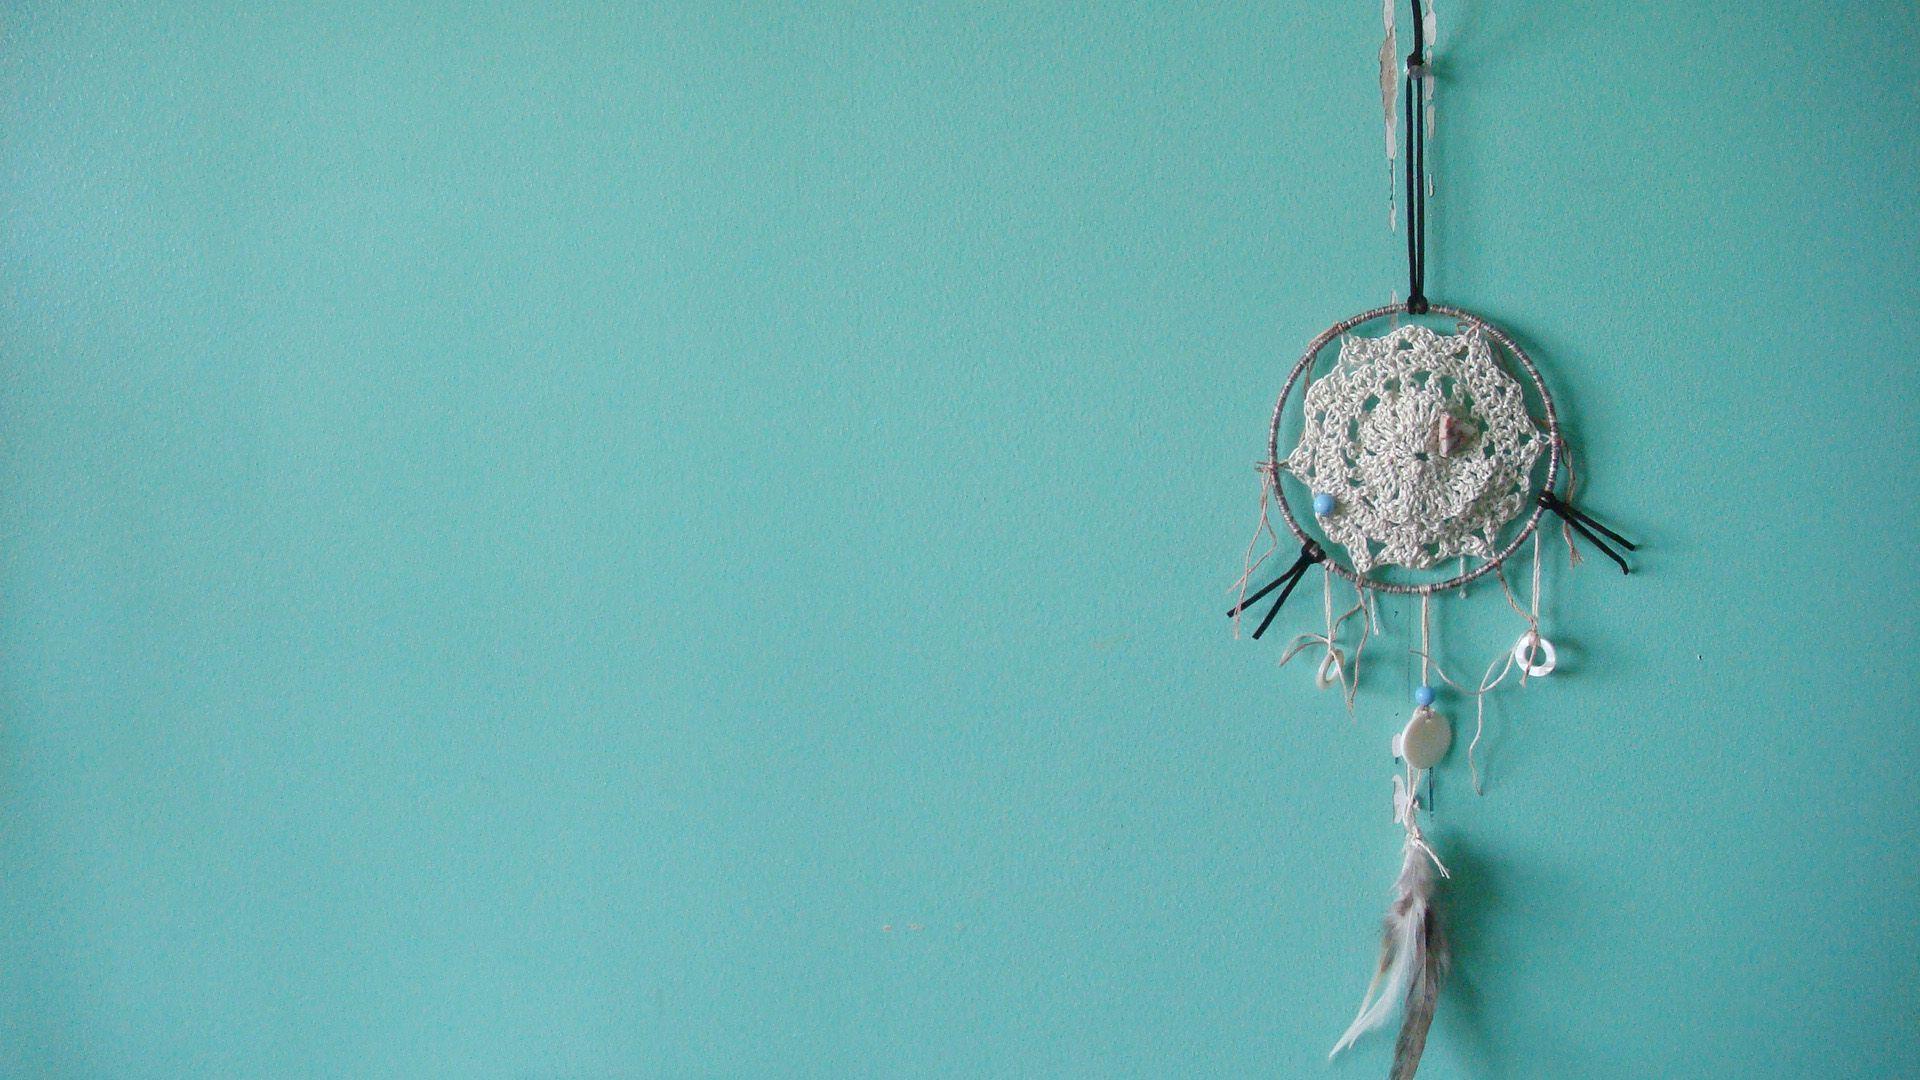 Wallpapers For > Dreamcatcher Wallpaper Tumblr